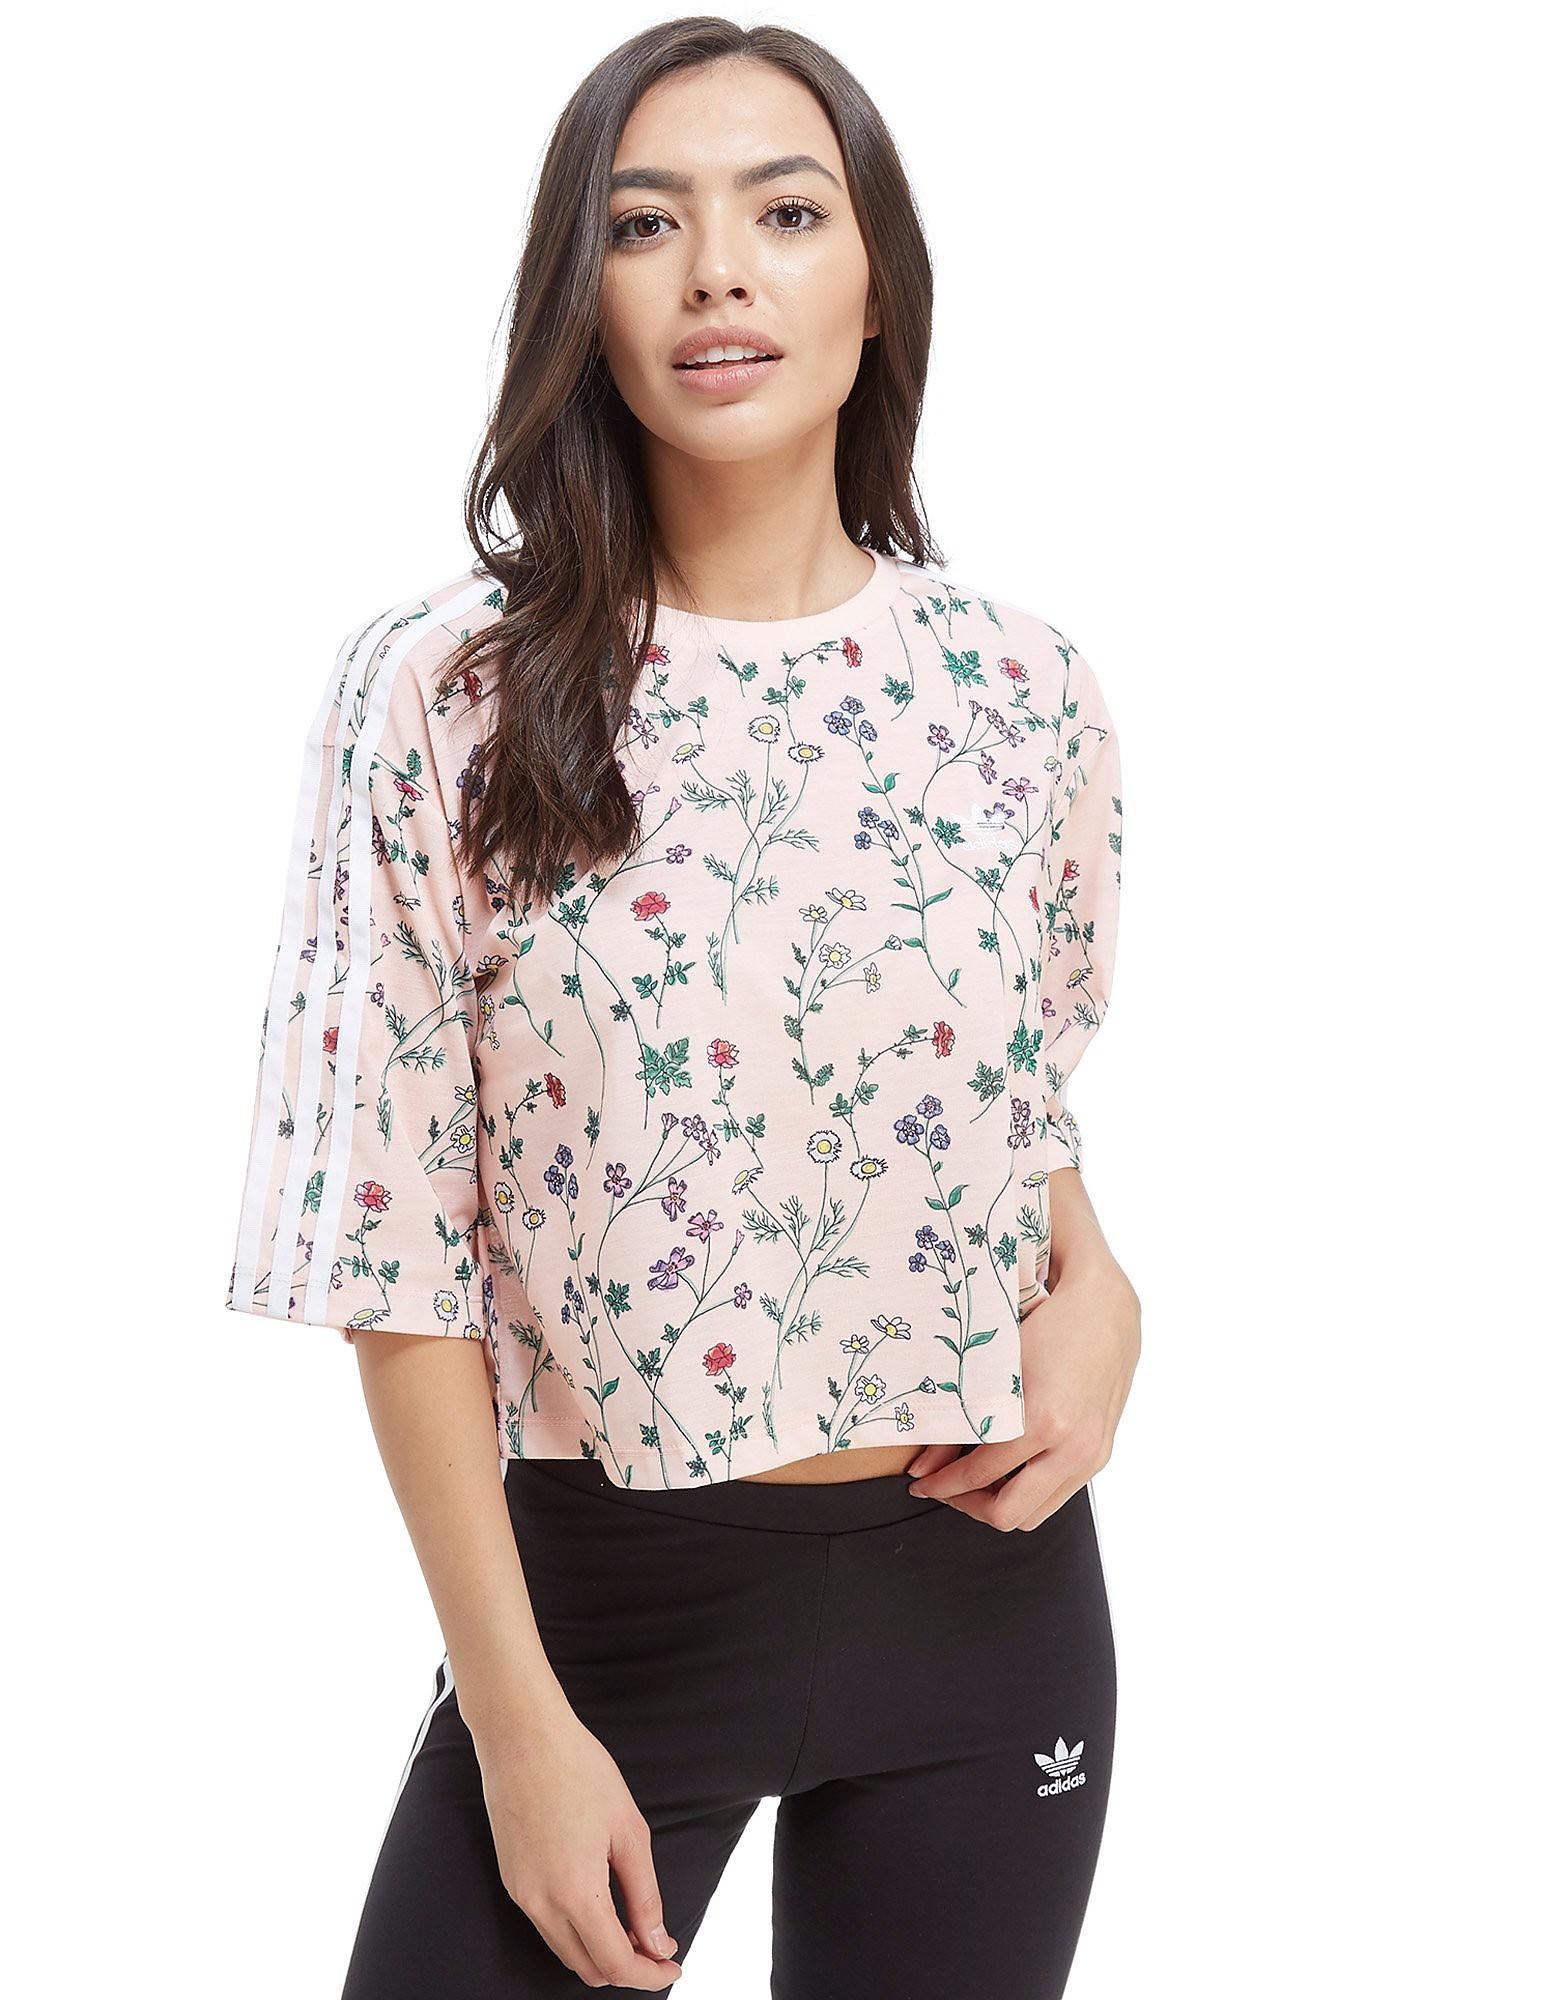 adidas Originals All Over Print Floral Crop T-Shirt